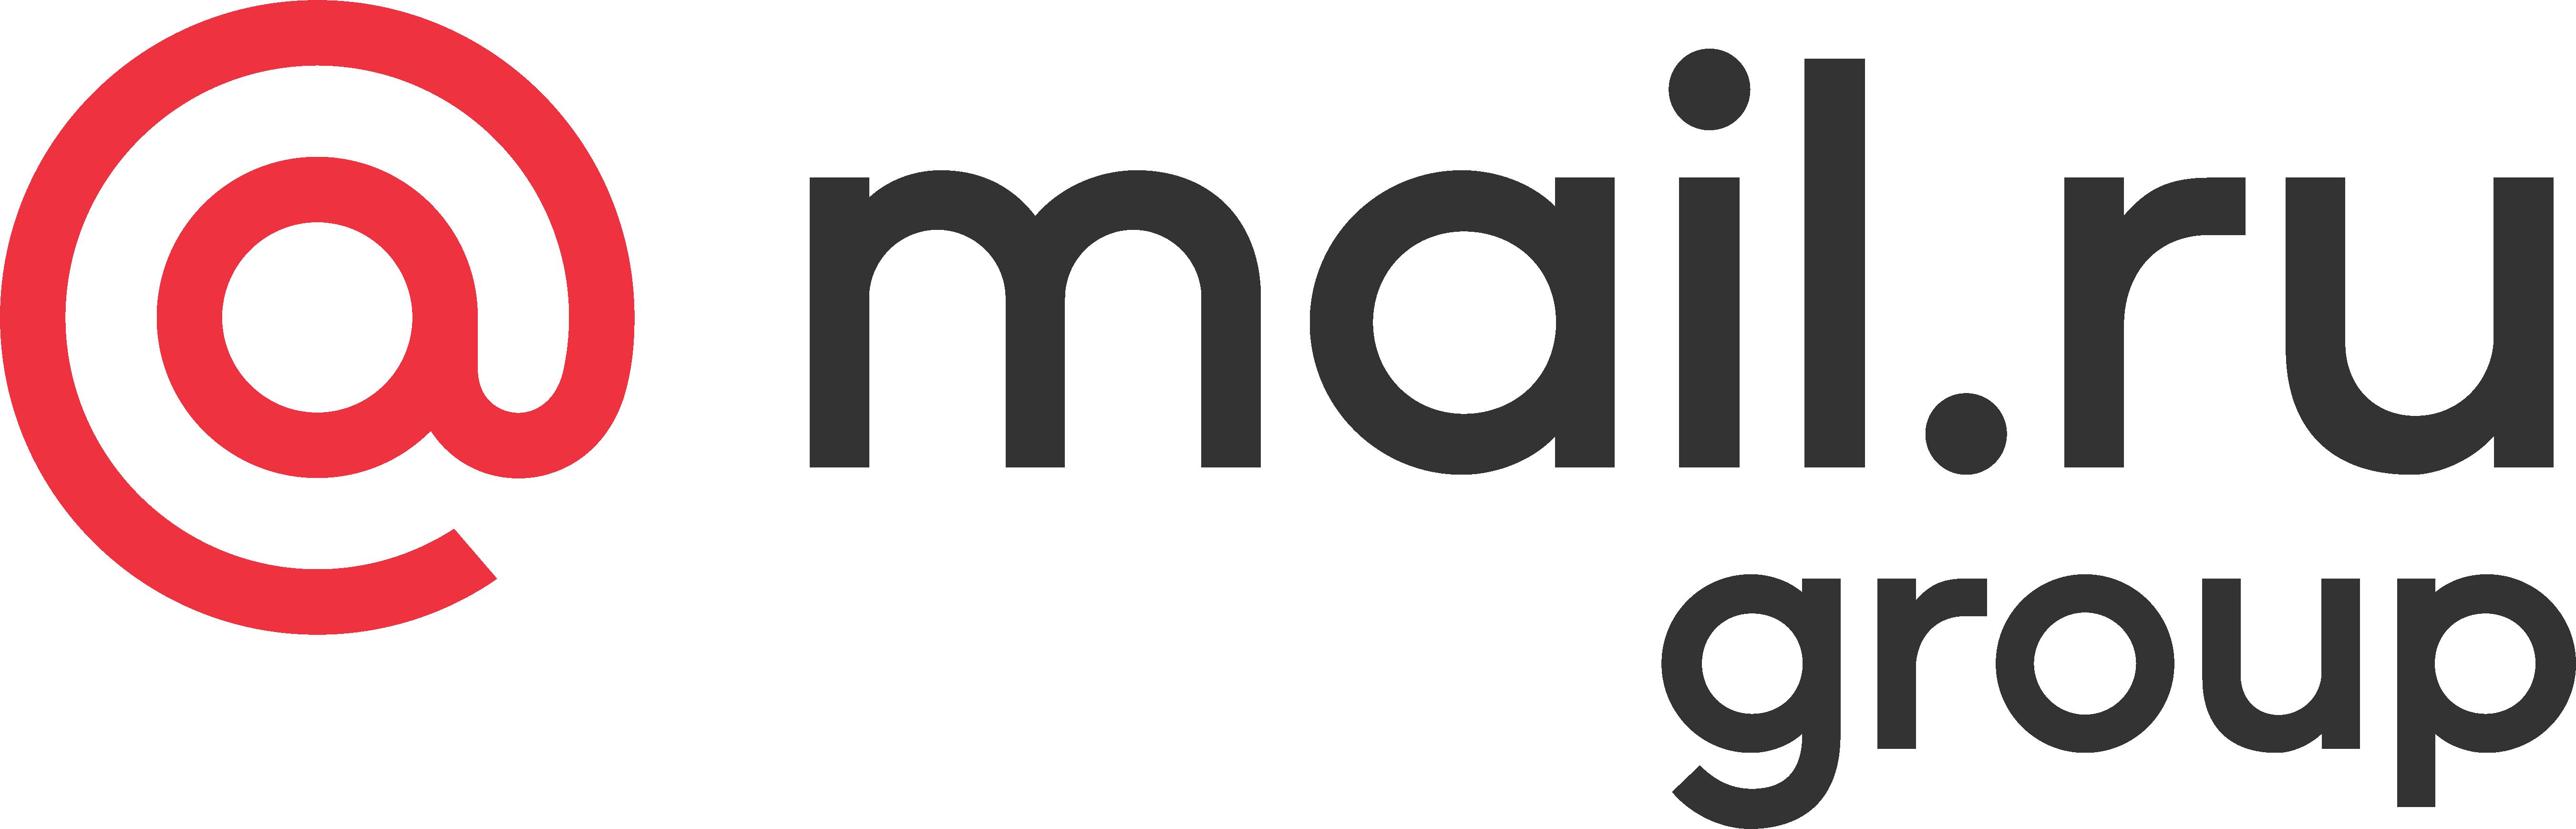 Картинки по запросу mail ru group logo